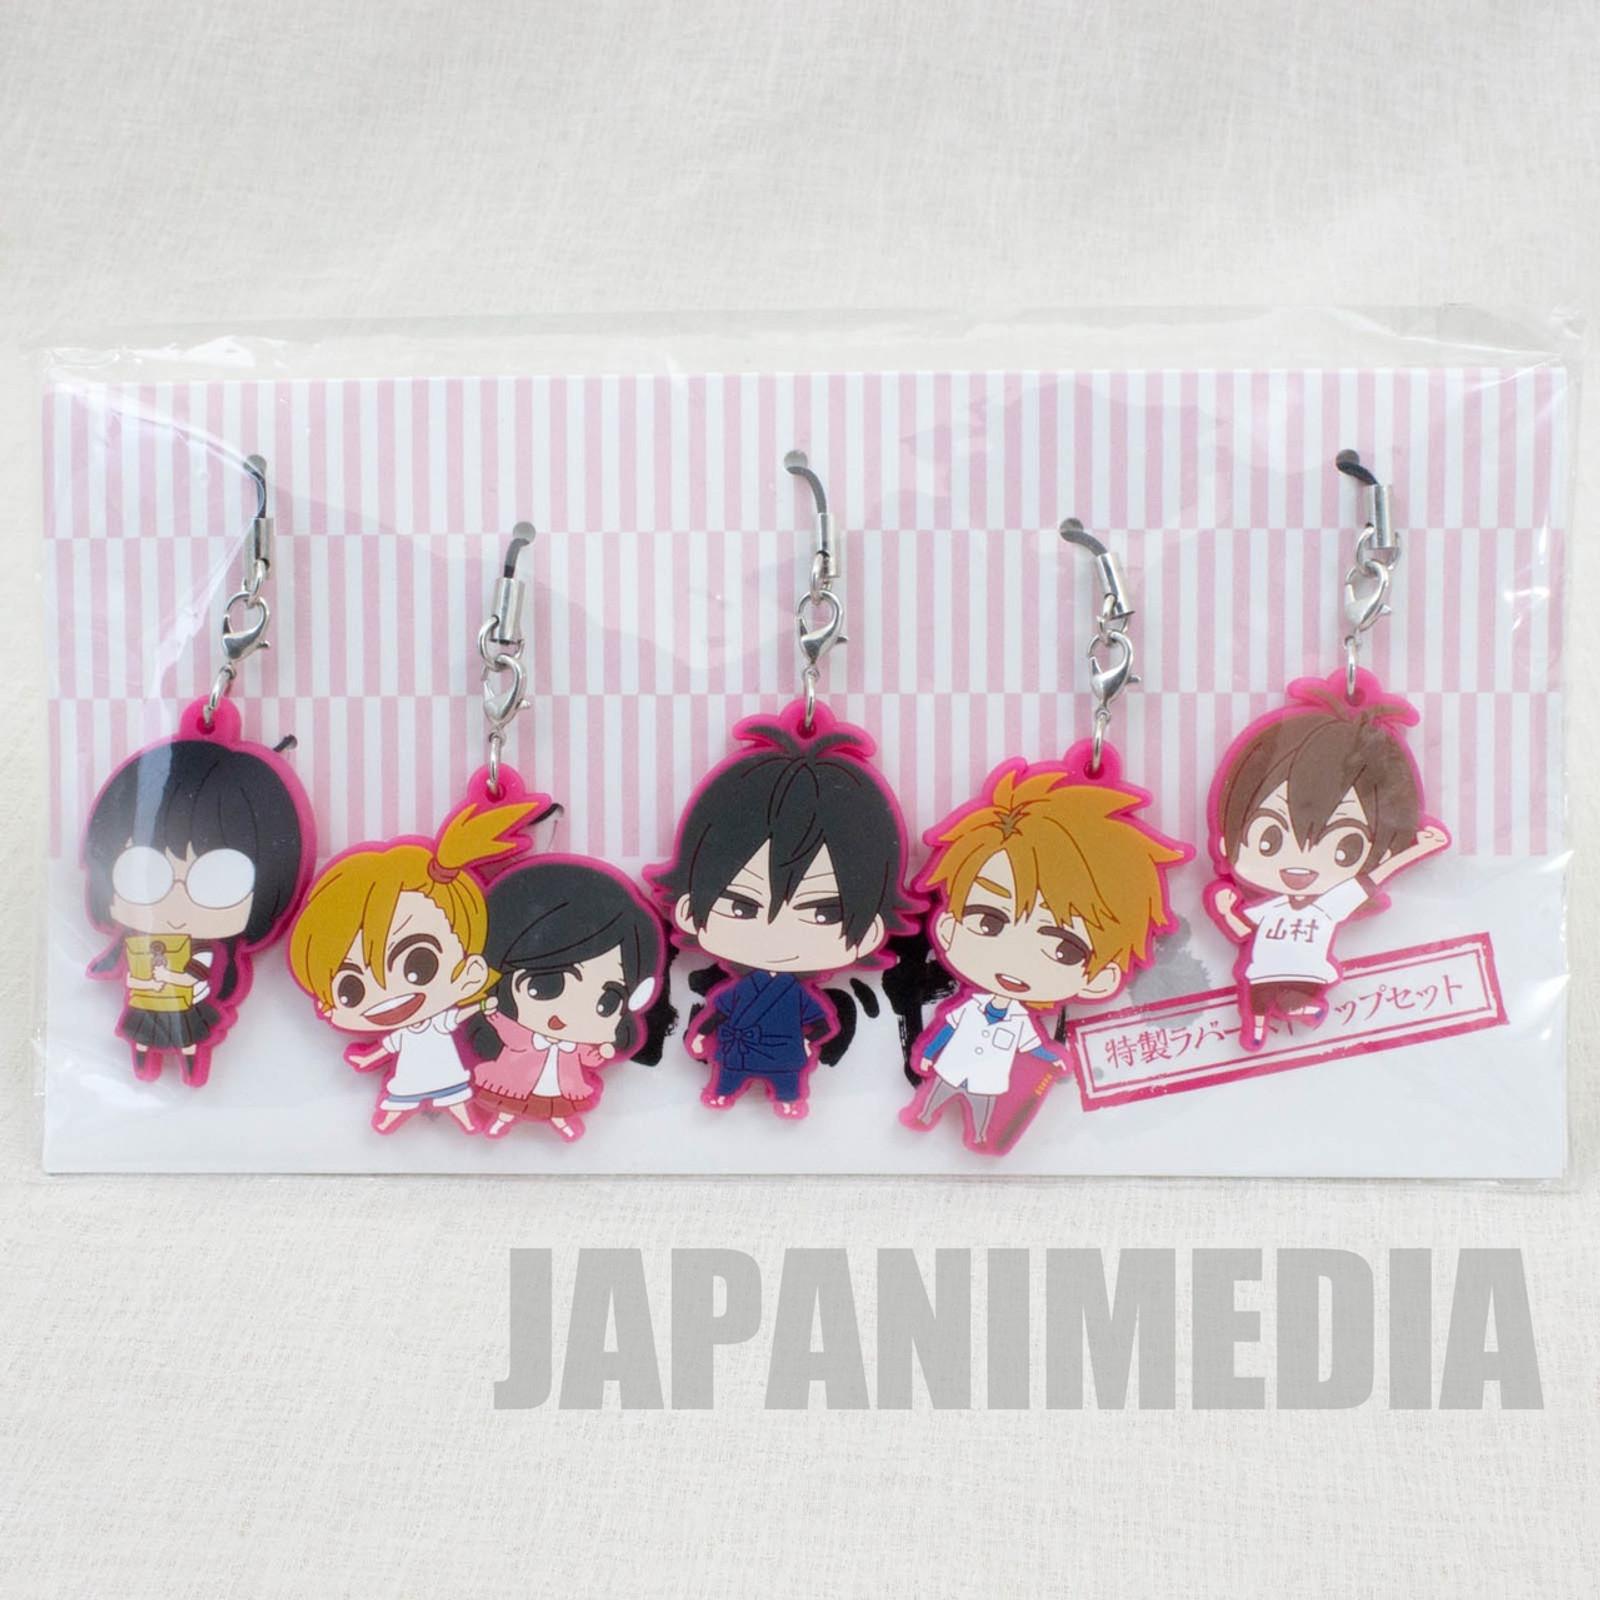 Barakamon Mascot Rubber Strap 5pc Set [Handa | Naru & Hina | Miwa | Tamako | Hiroshi] Square Enix JAPAN ANIME MANGA